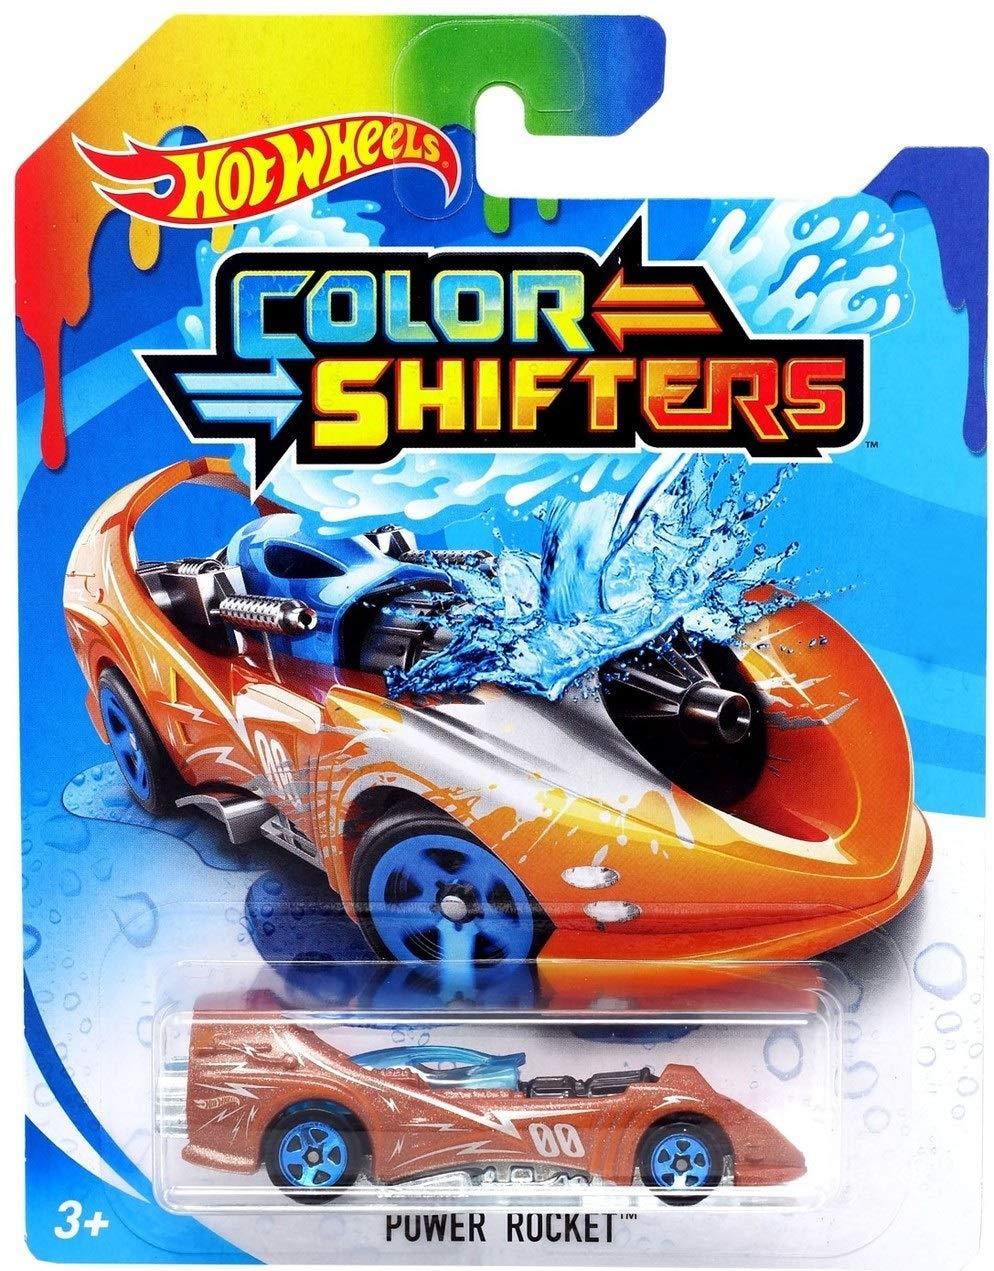 Hot Wheels Colour Shifters - Power Rocket